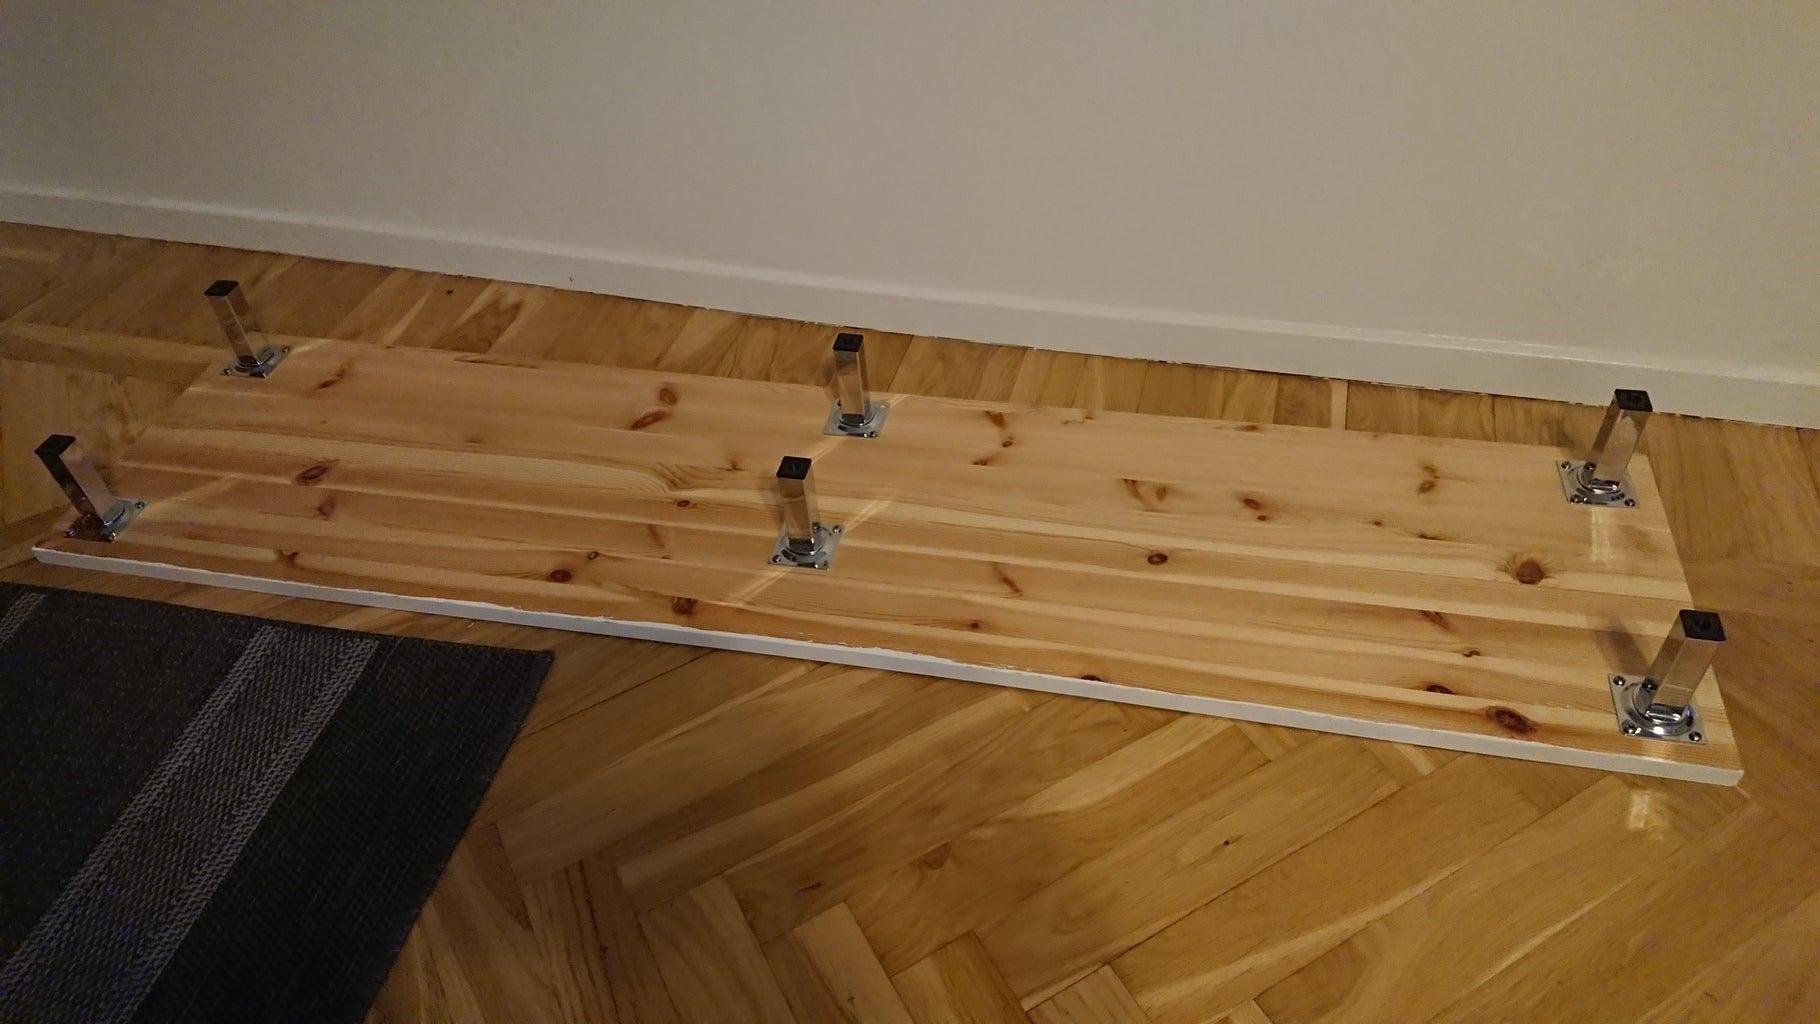 Mount the Furniture Legs